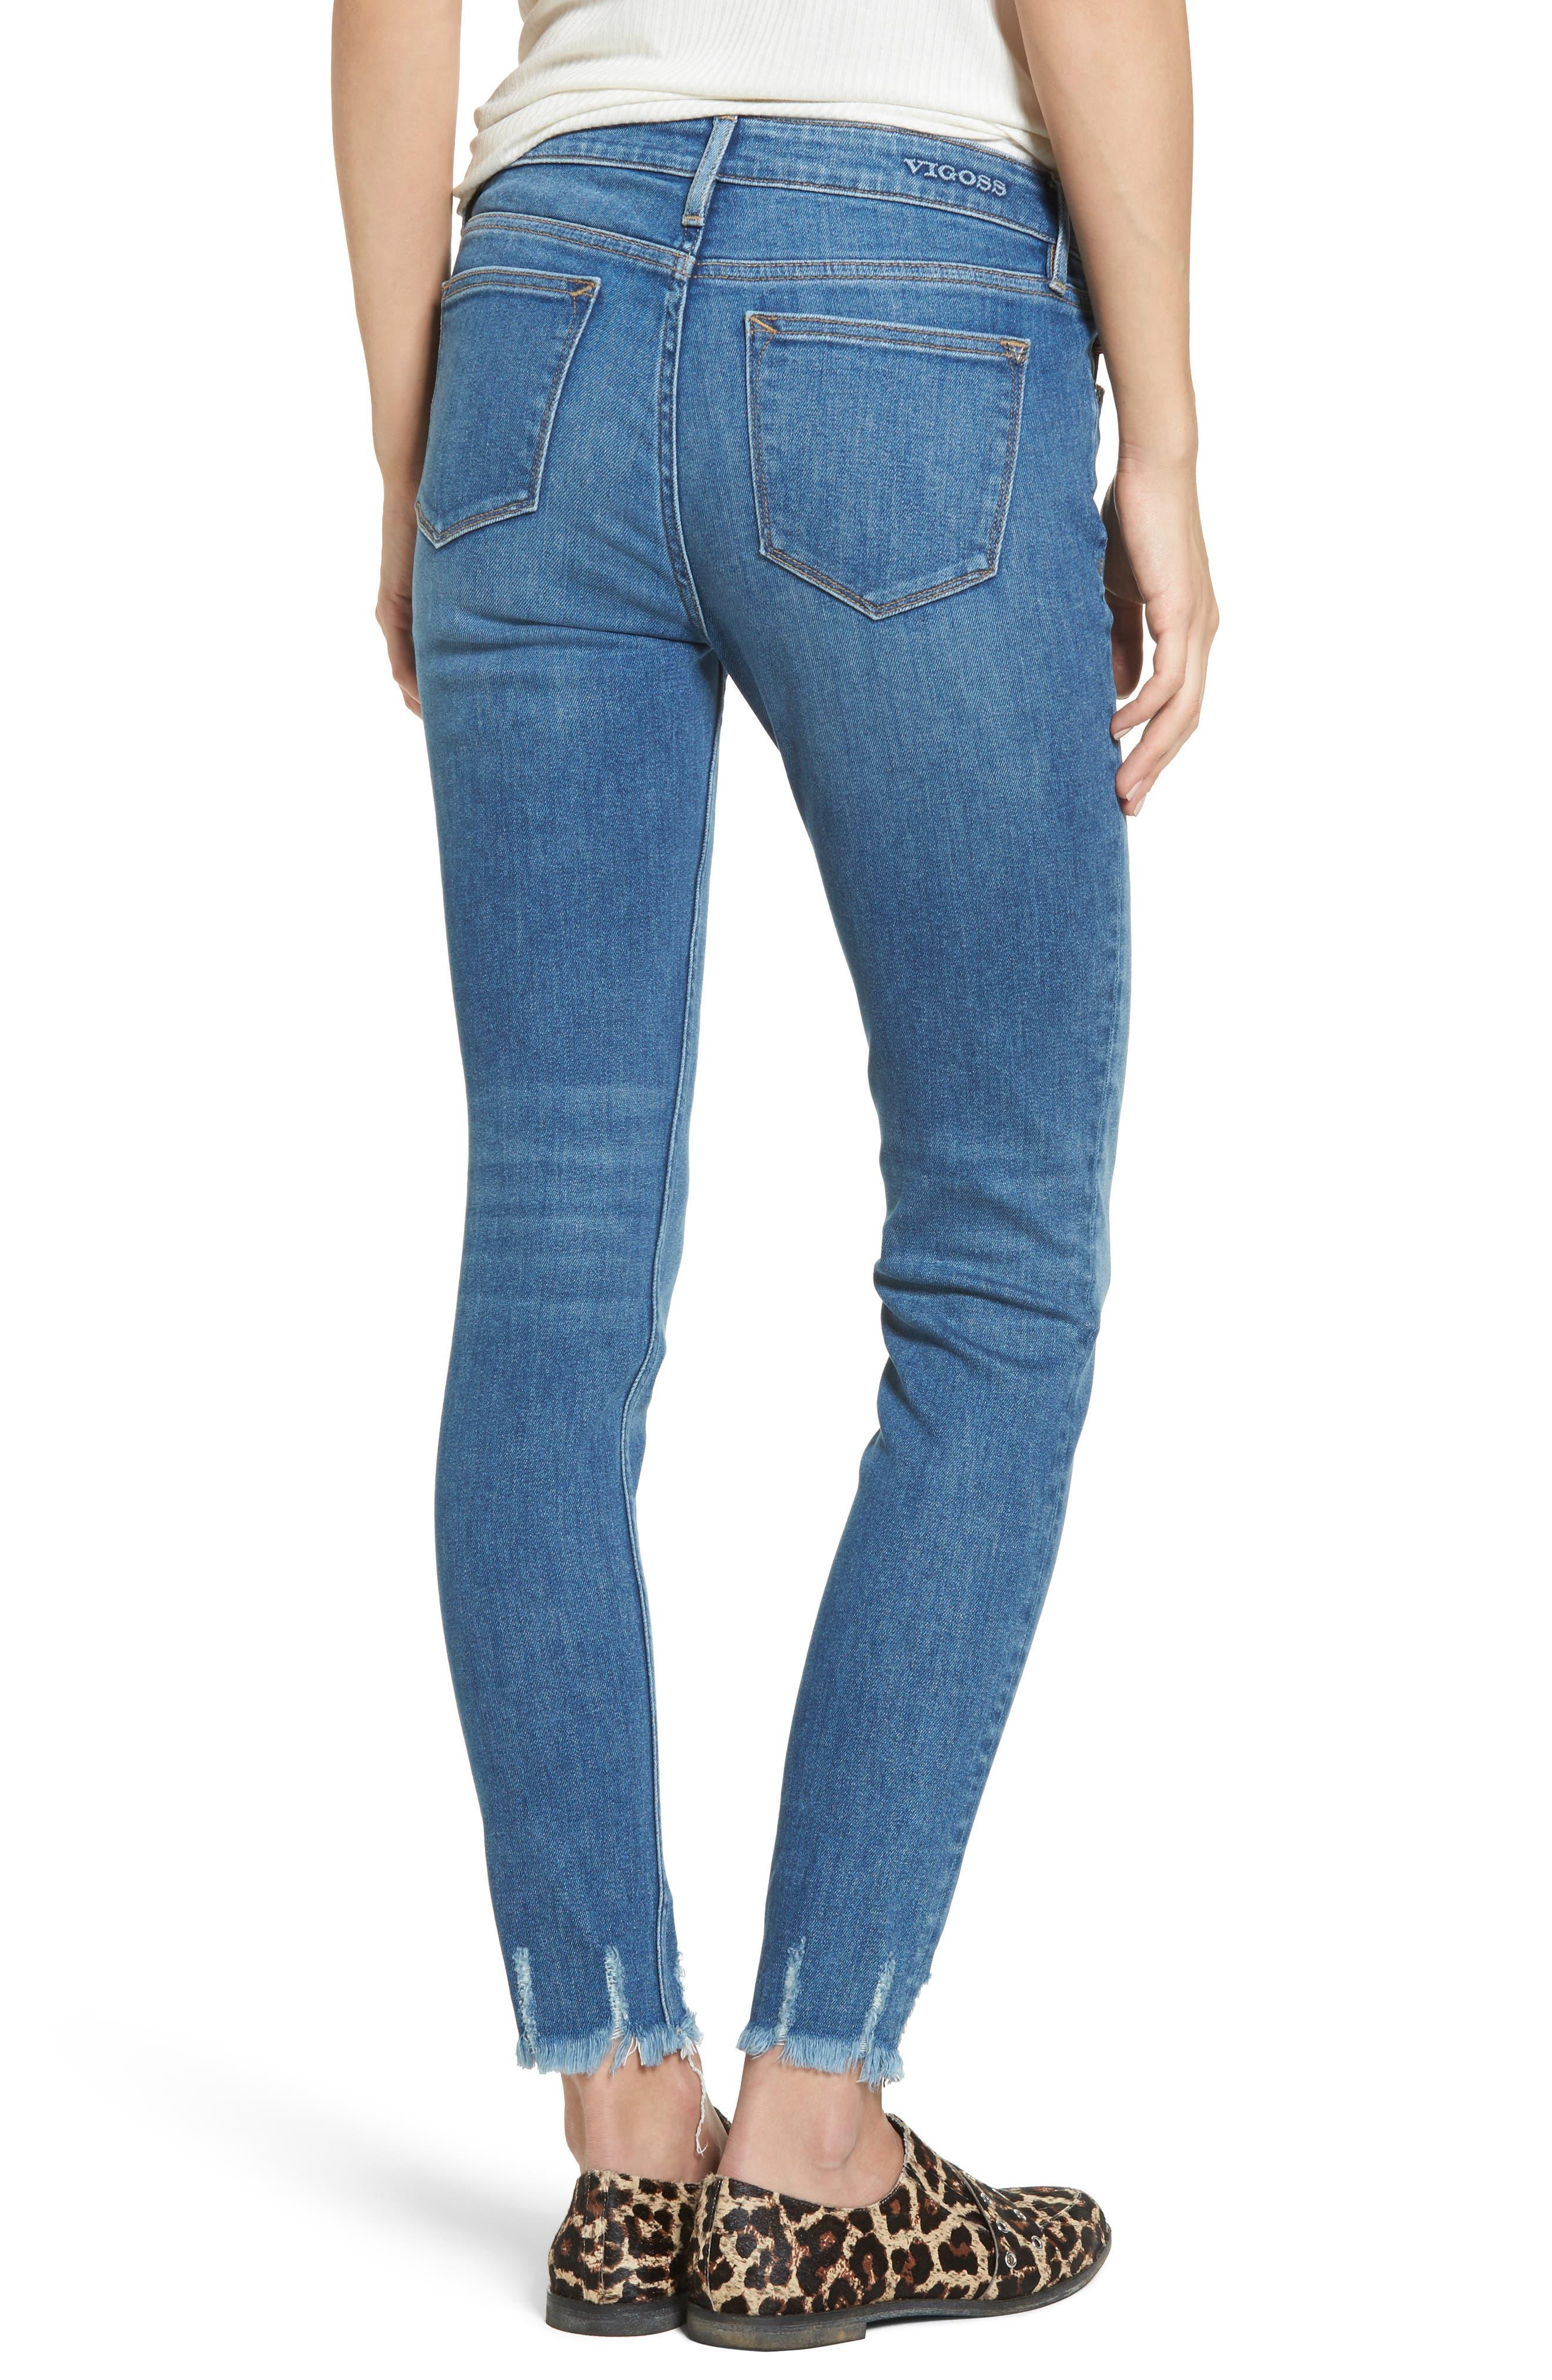 Jagger Skinny Jeans,                             Alternate thumbnail 2, color,                             426